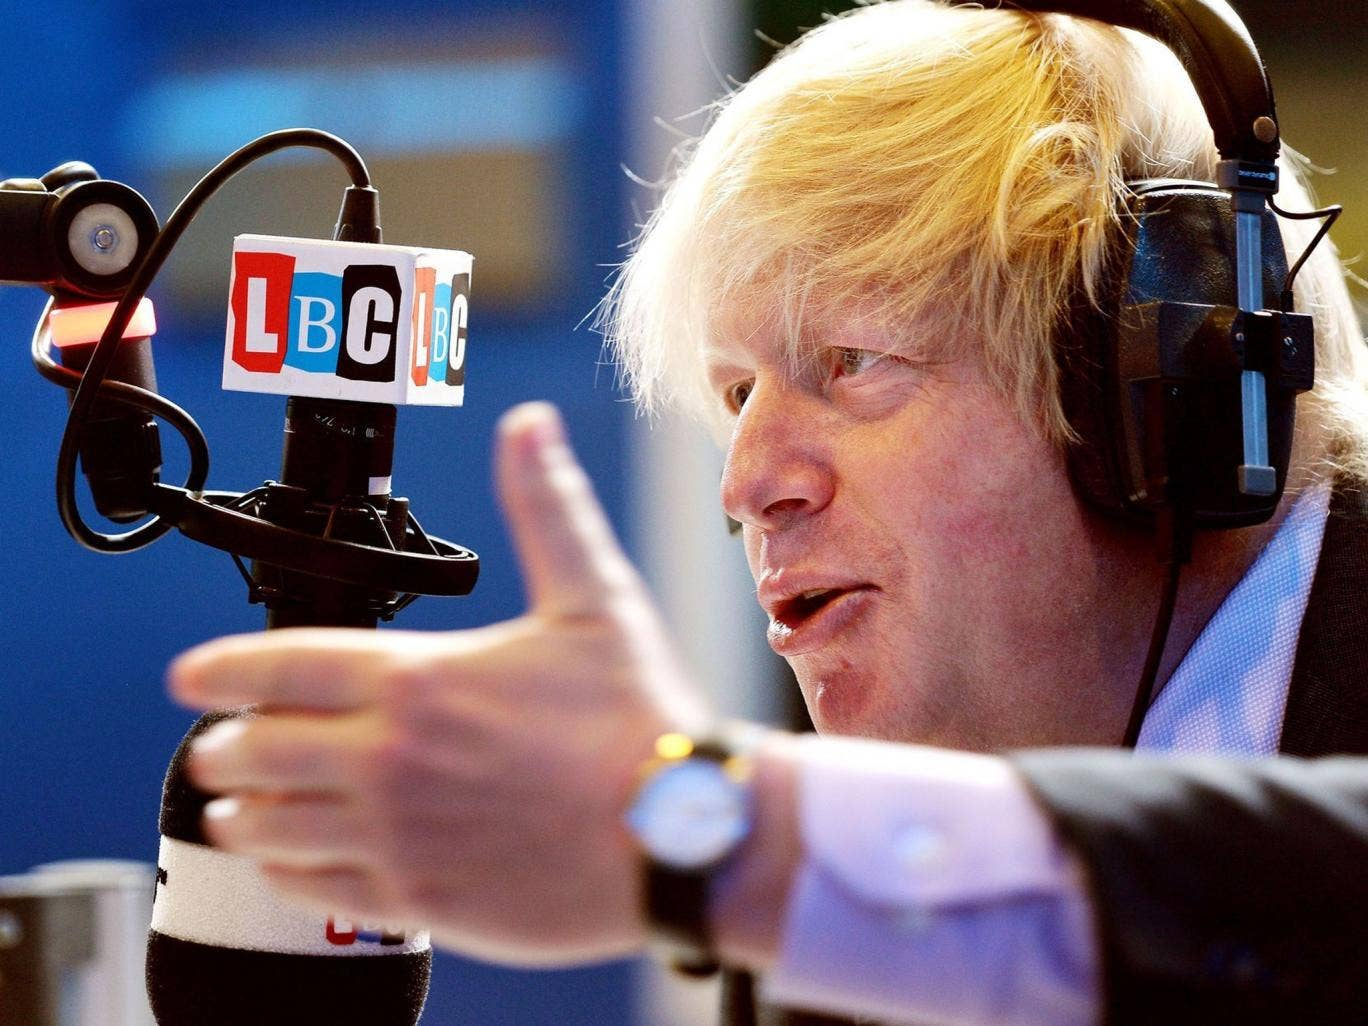 Mayor of London Boris Johnson expresses his views on LBC